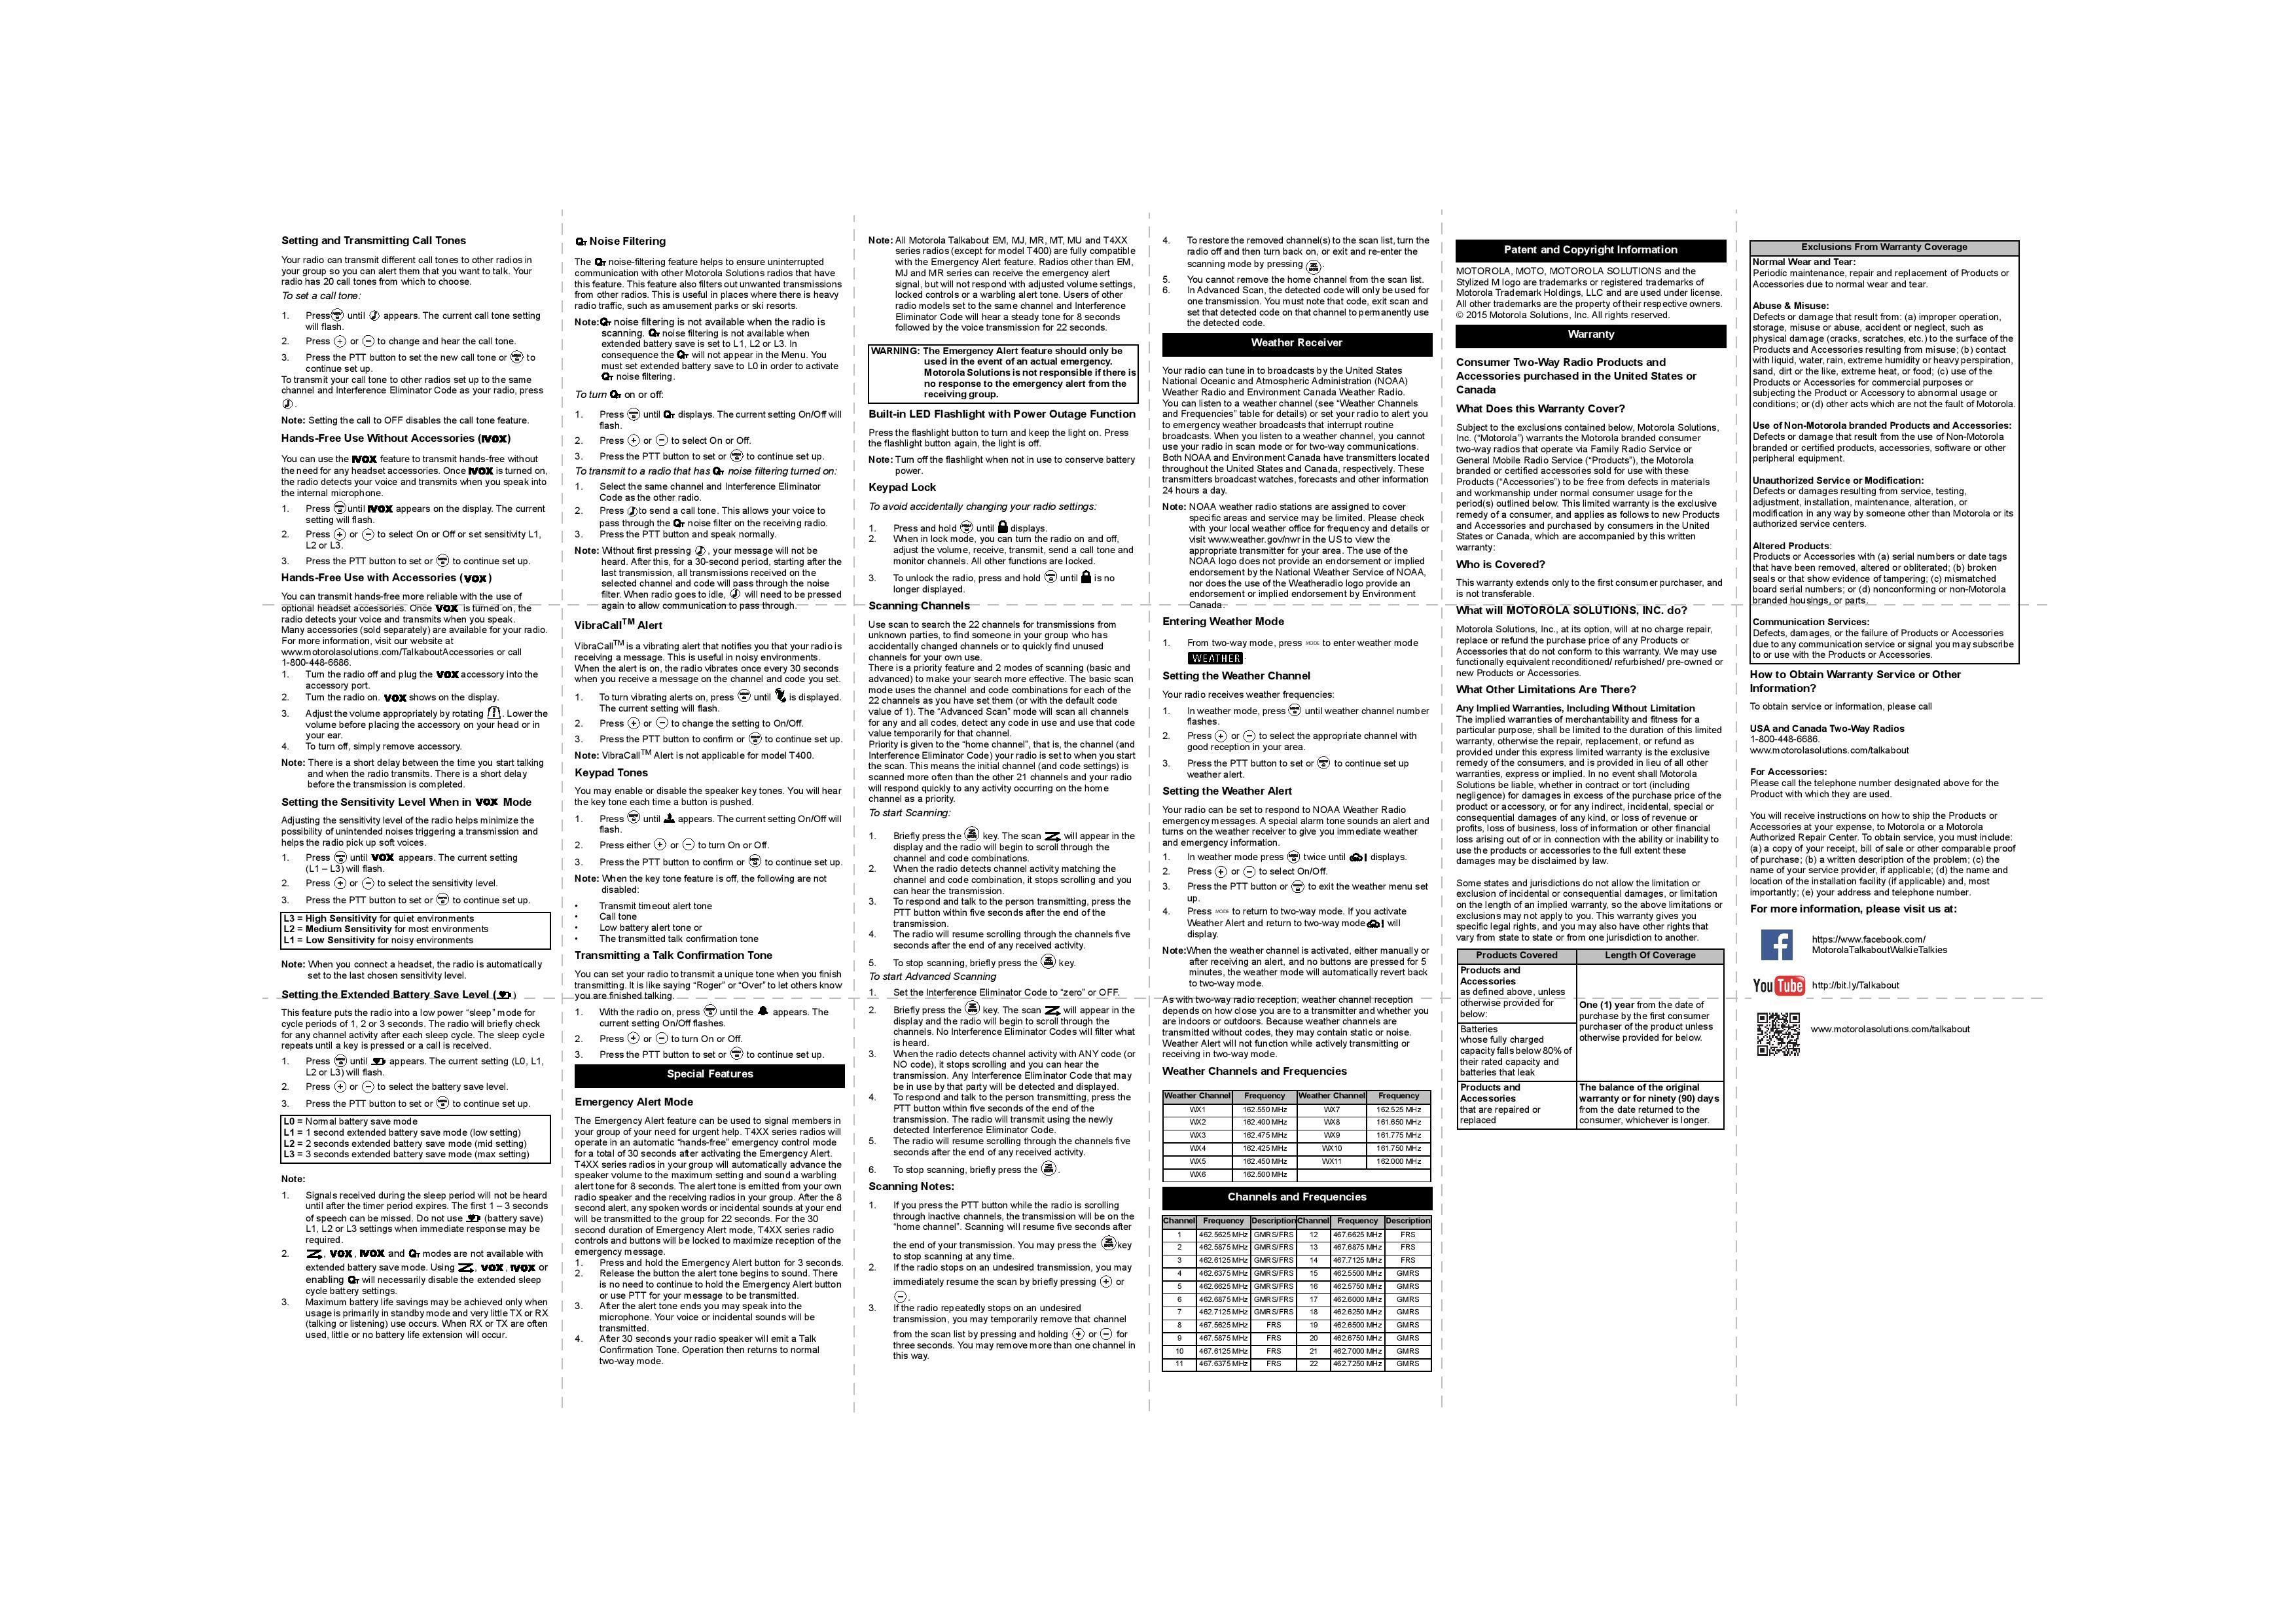 bush dwfs125w user manual ndgymdg pdf bush dwfs126w user manual rh qualityinnsantaclaraca com bush soundbar instruction manual bush tv instruction manuals